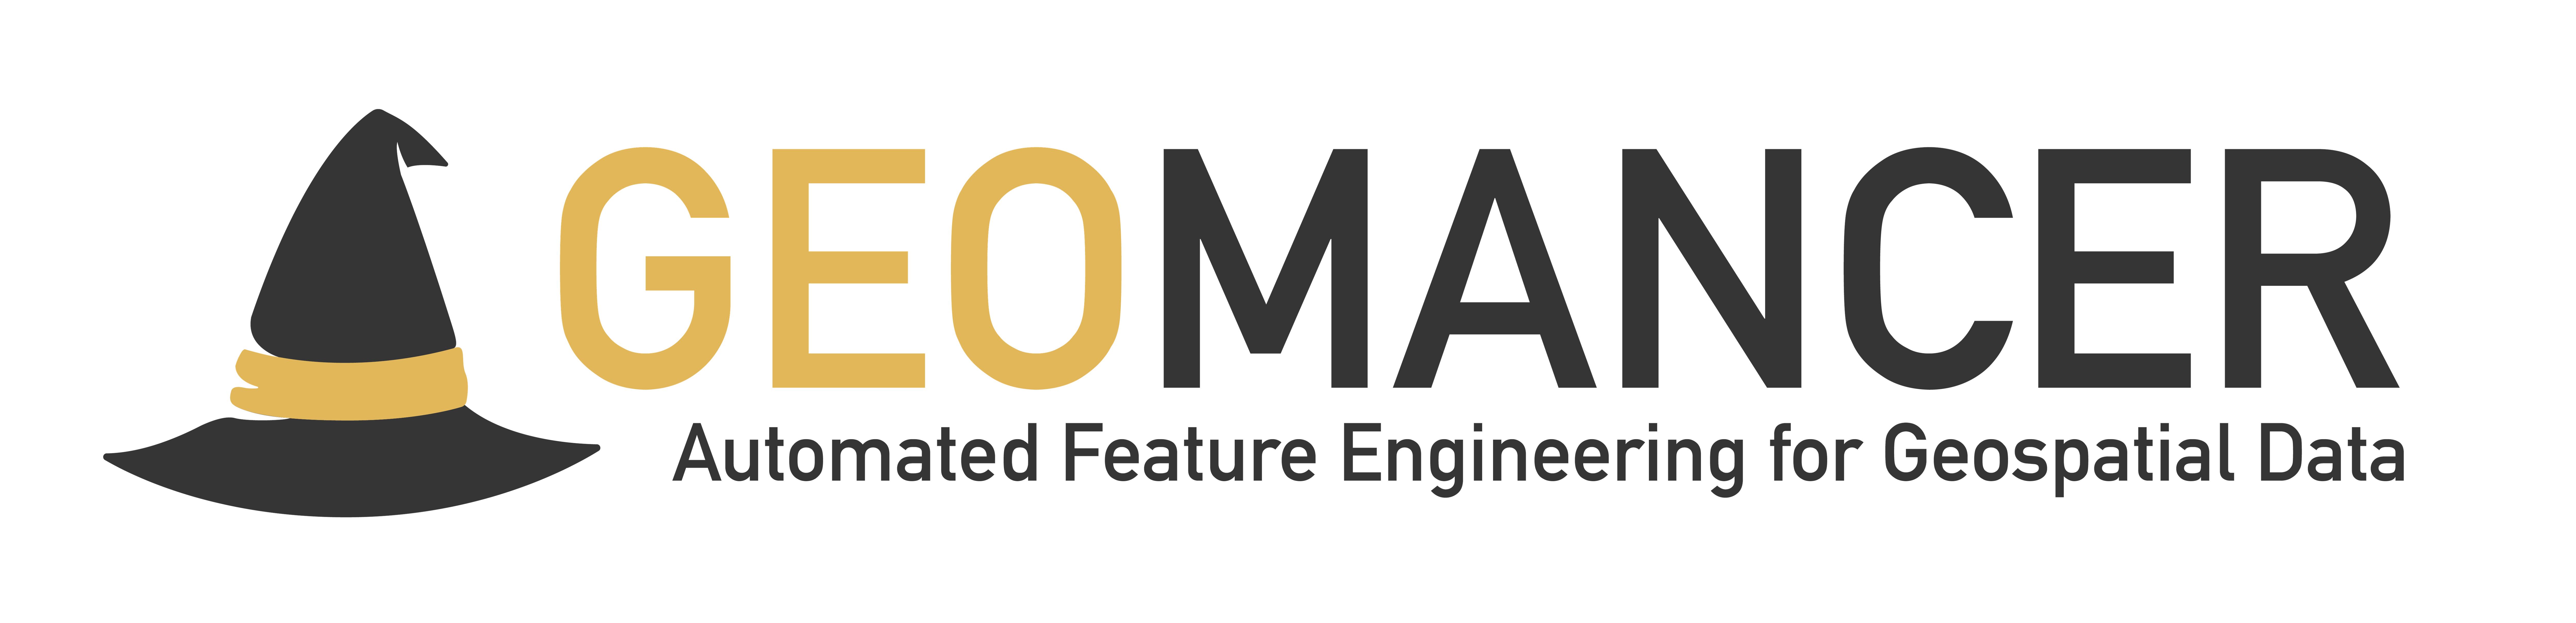 Geomancer Logo